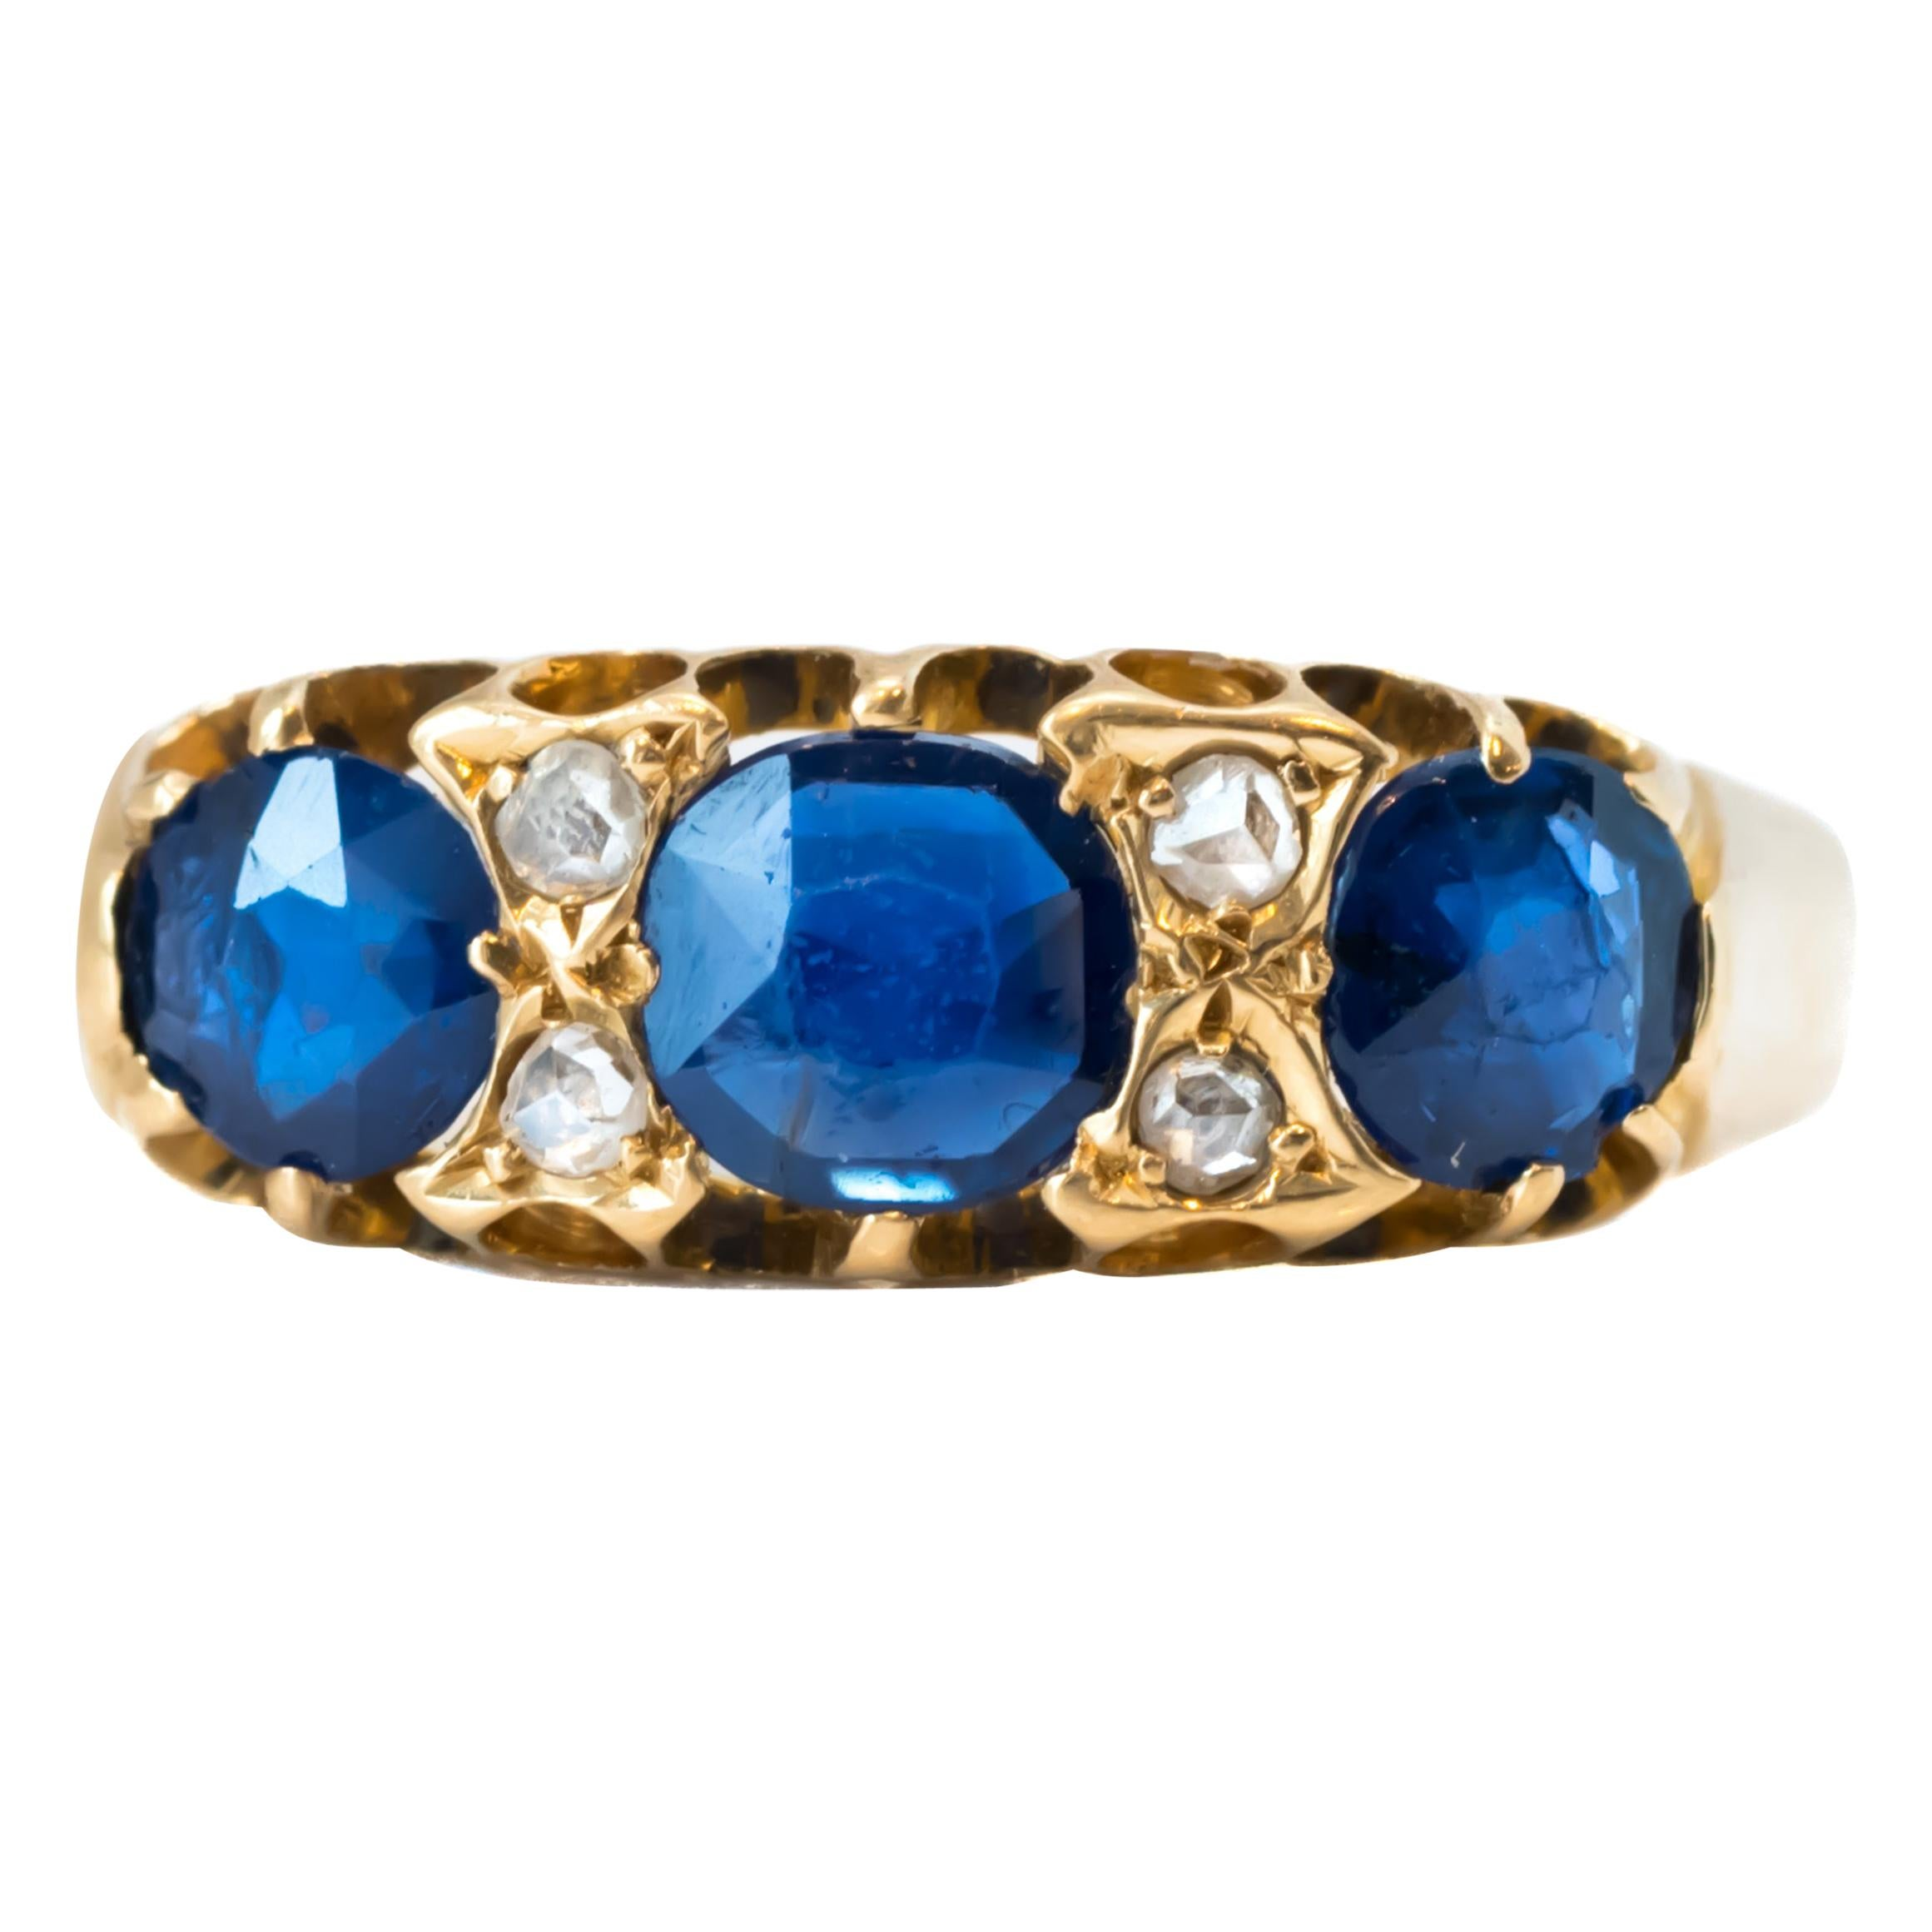 1920s Blue Sapphire and Diamond 18 Karat Yellow Gold Band Ring